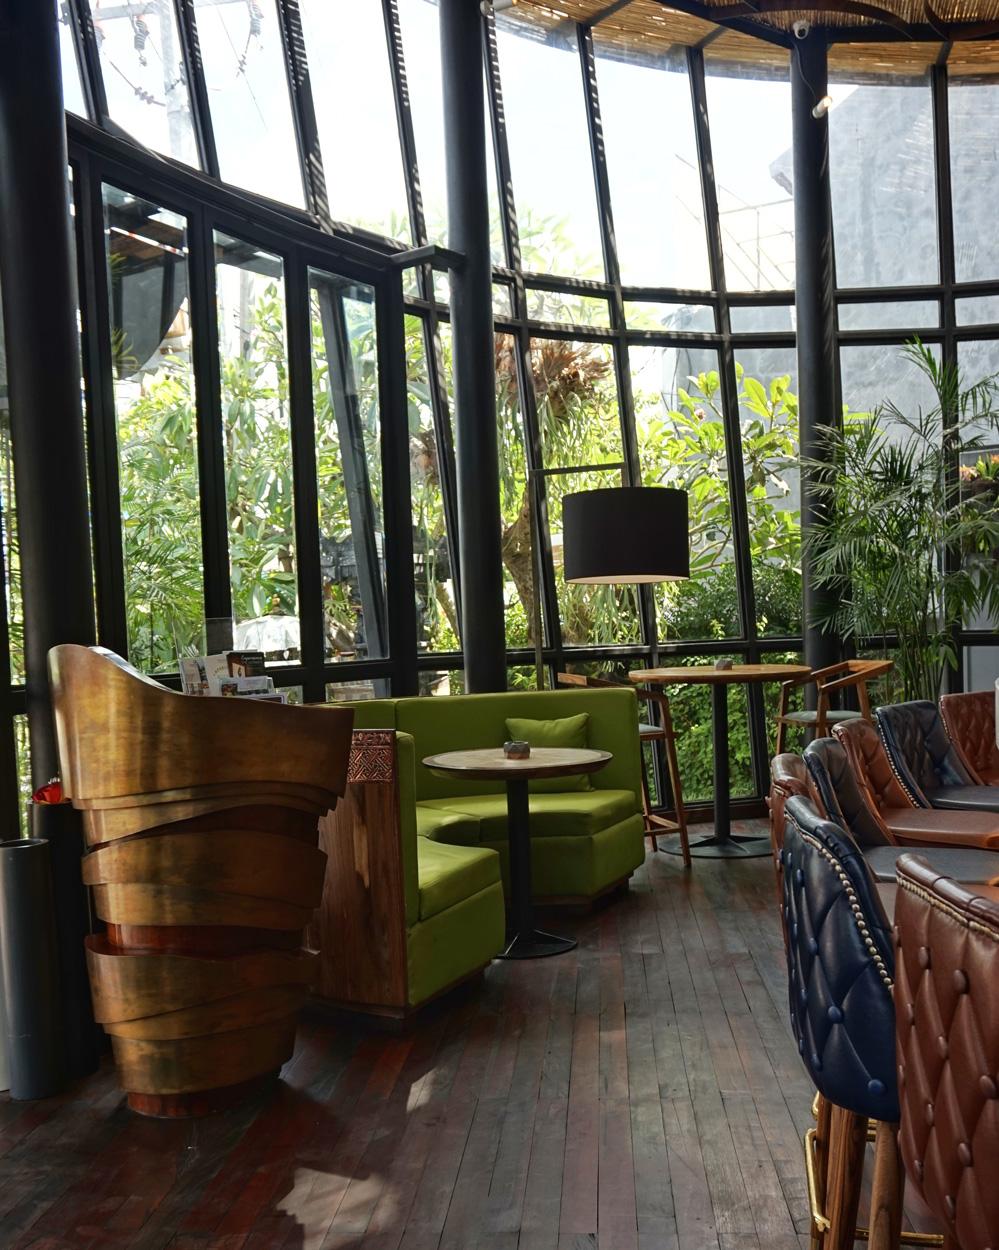 Best hotel in seminyak jambuluwuk 027 01 foodcious for Best hotels in seminyak